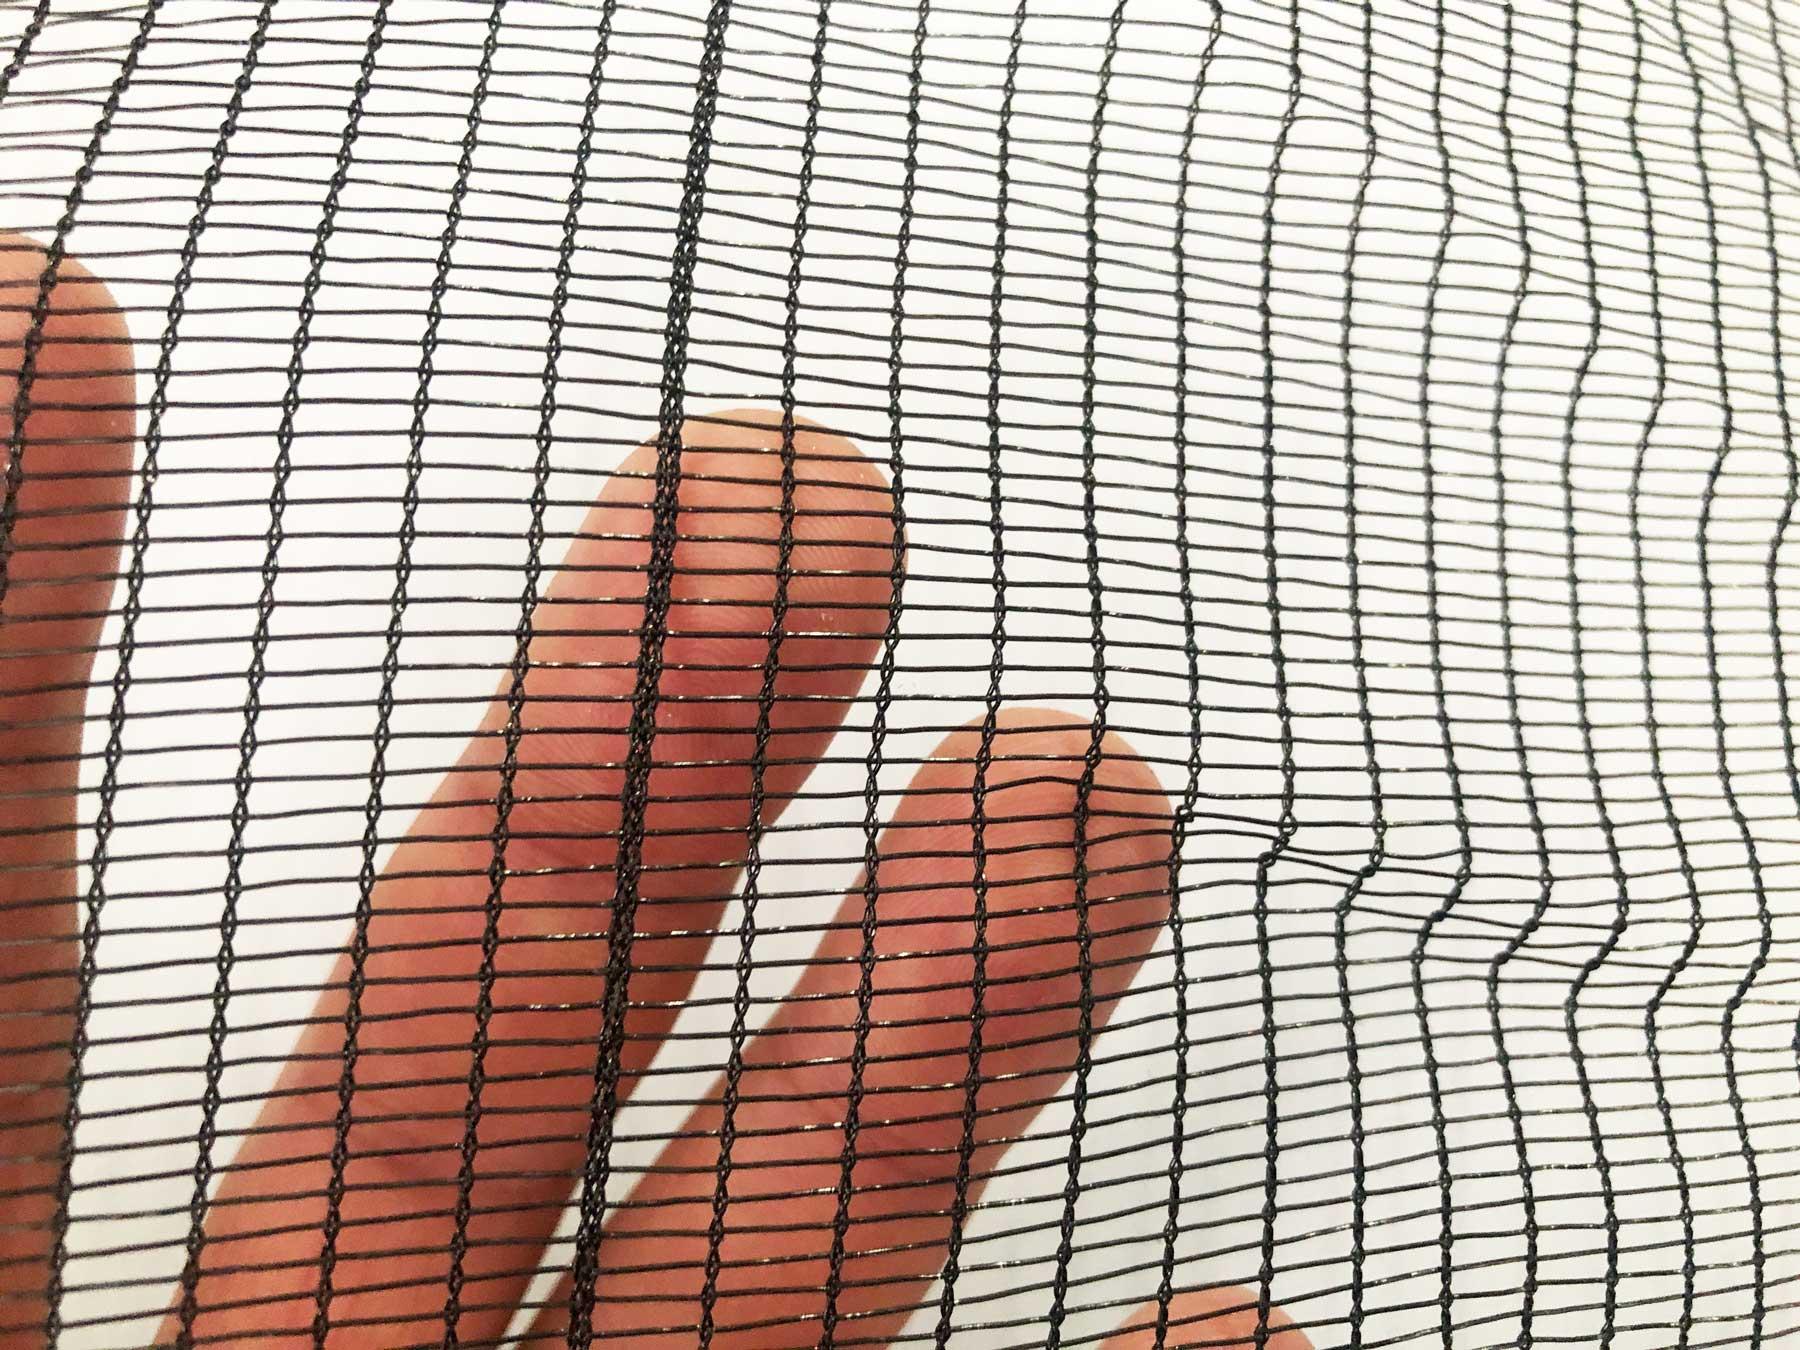 Tela Sombrite Nylon Monofilamento com Giro Inglês 50% 3x5